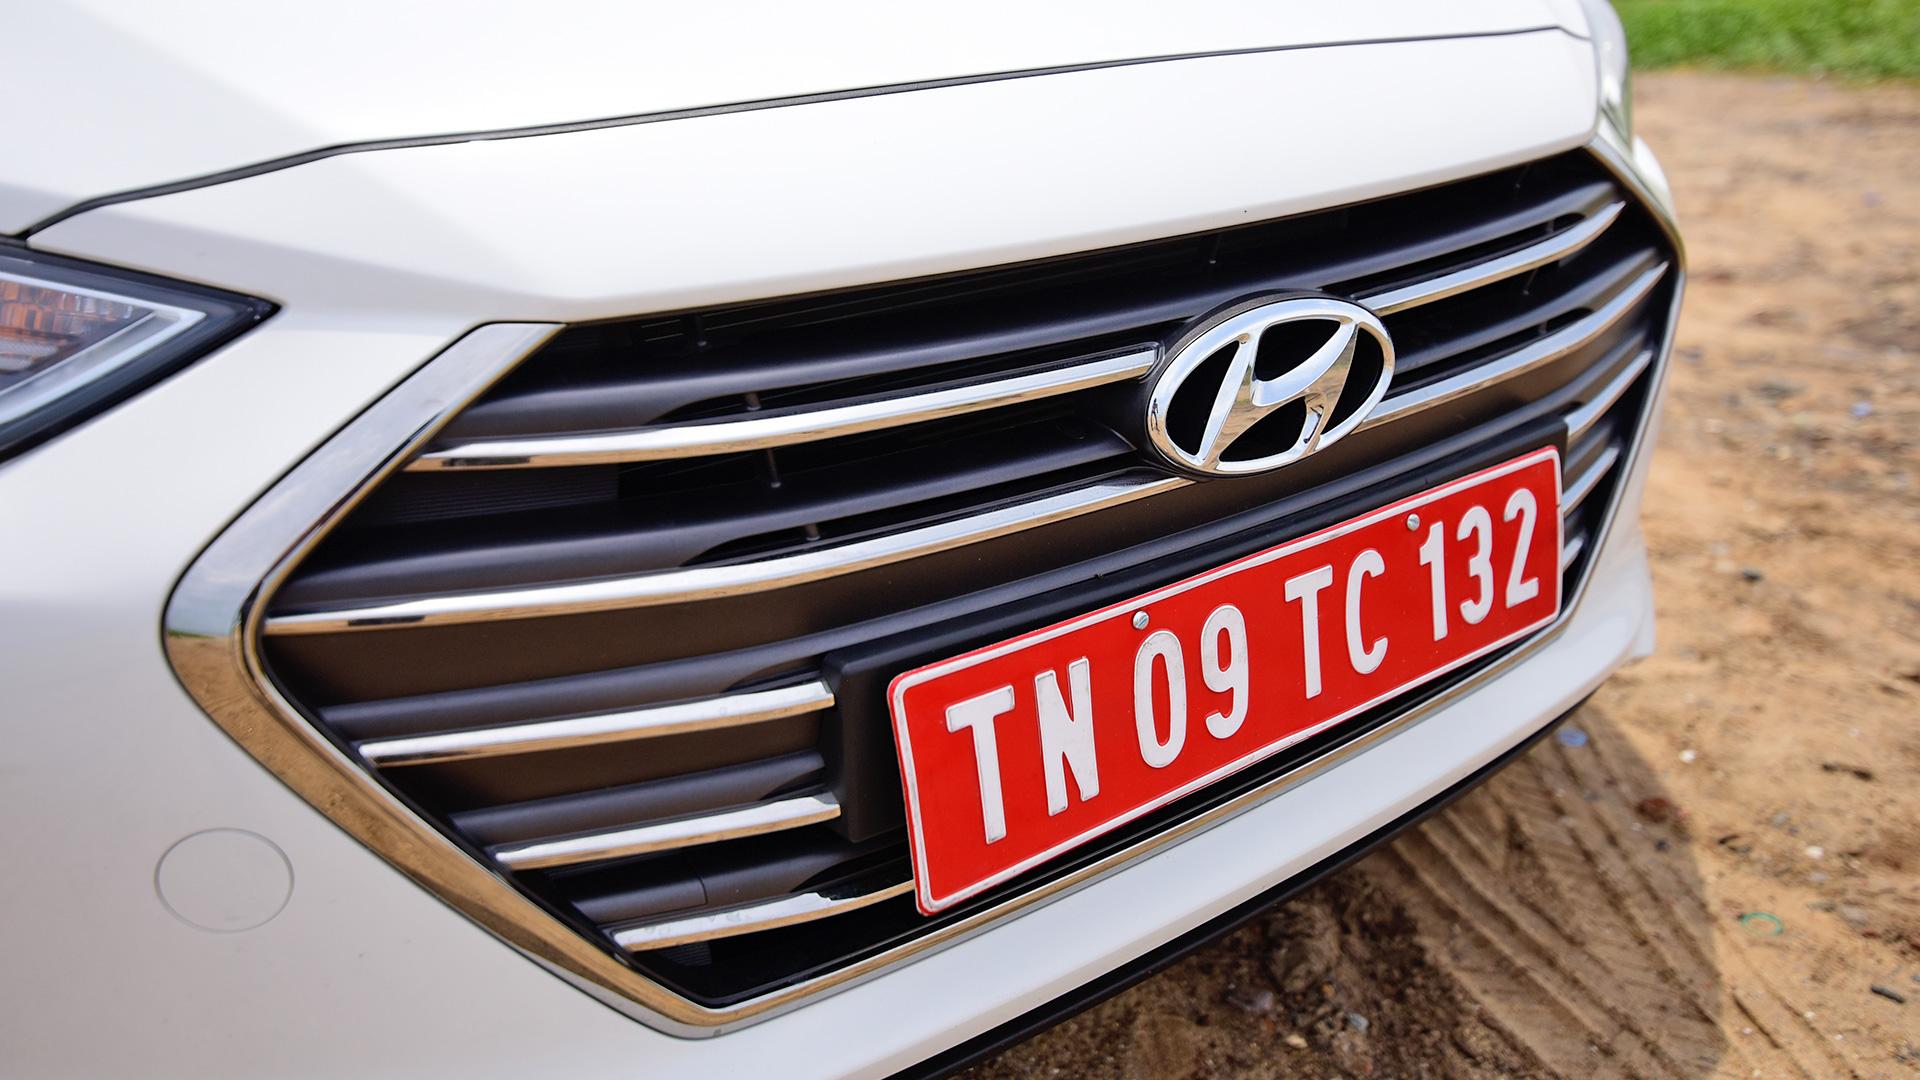 Hyundai Elantra 2016 2.0 Petrol SX (O)AT Exterior